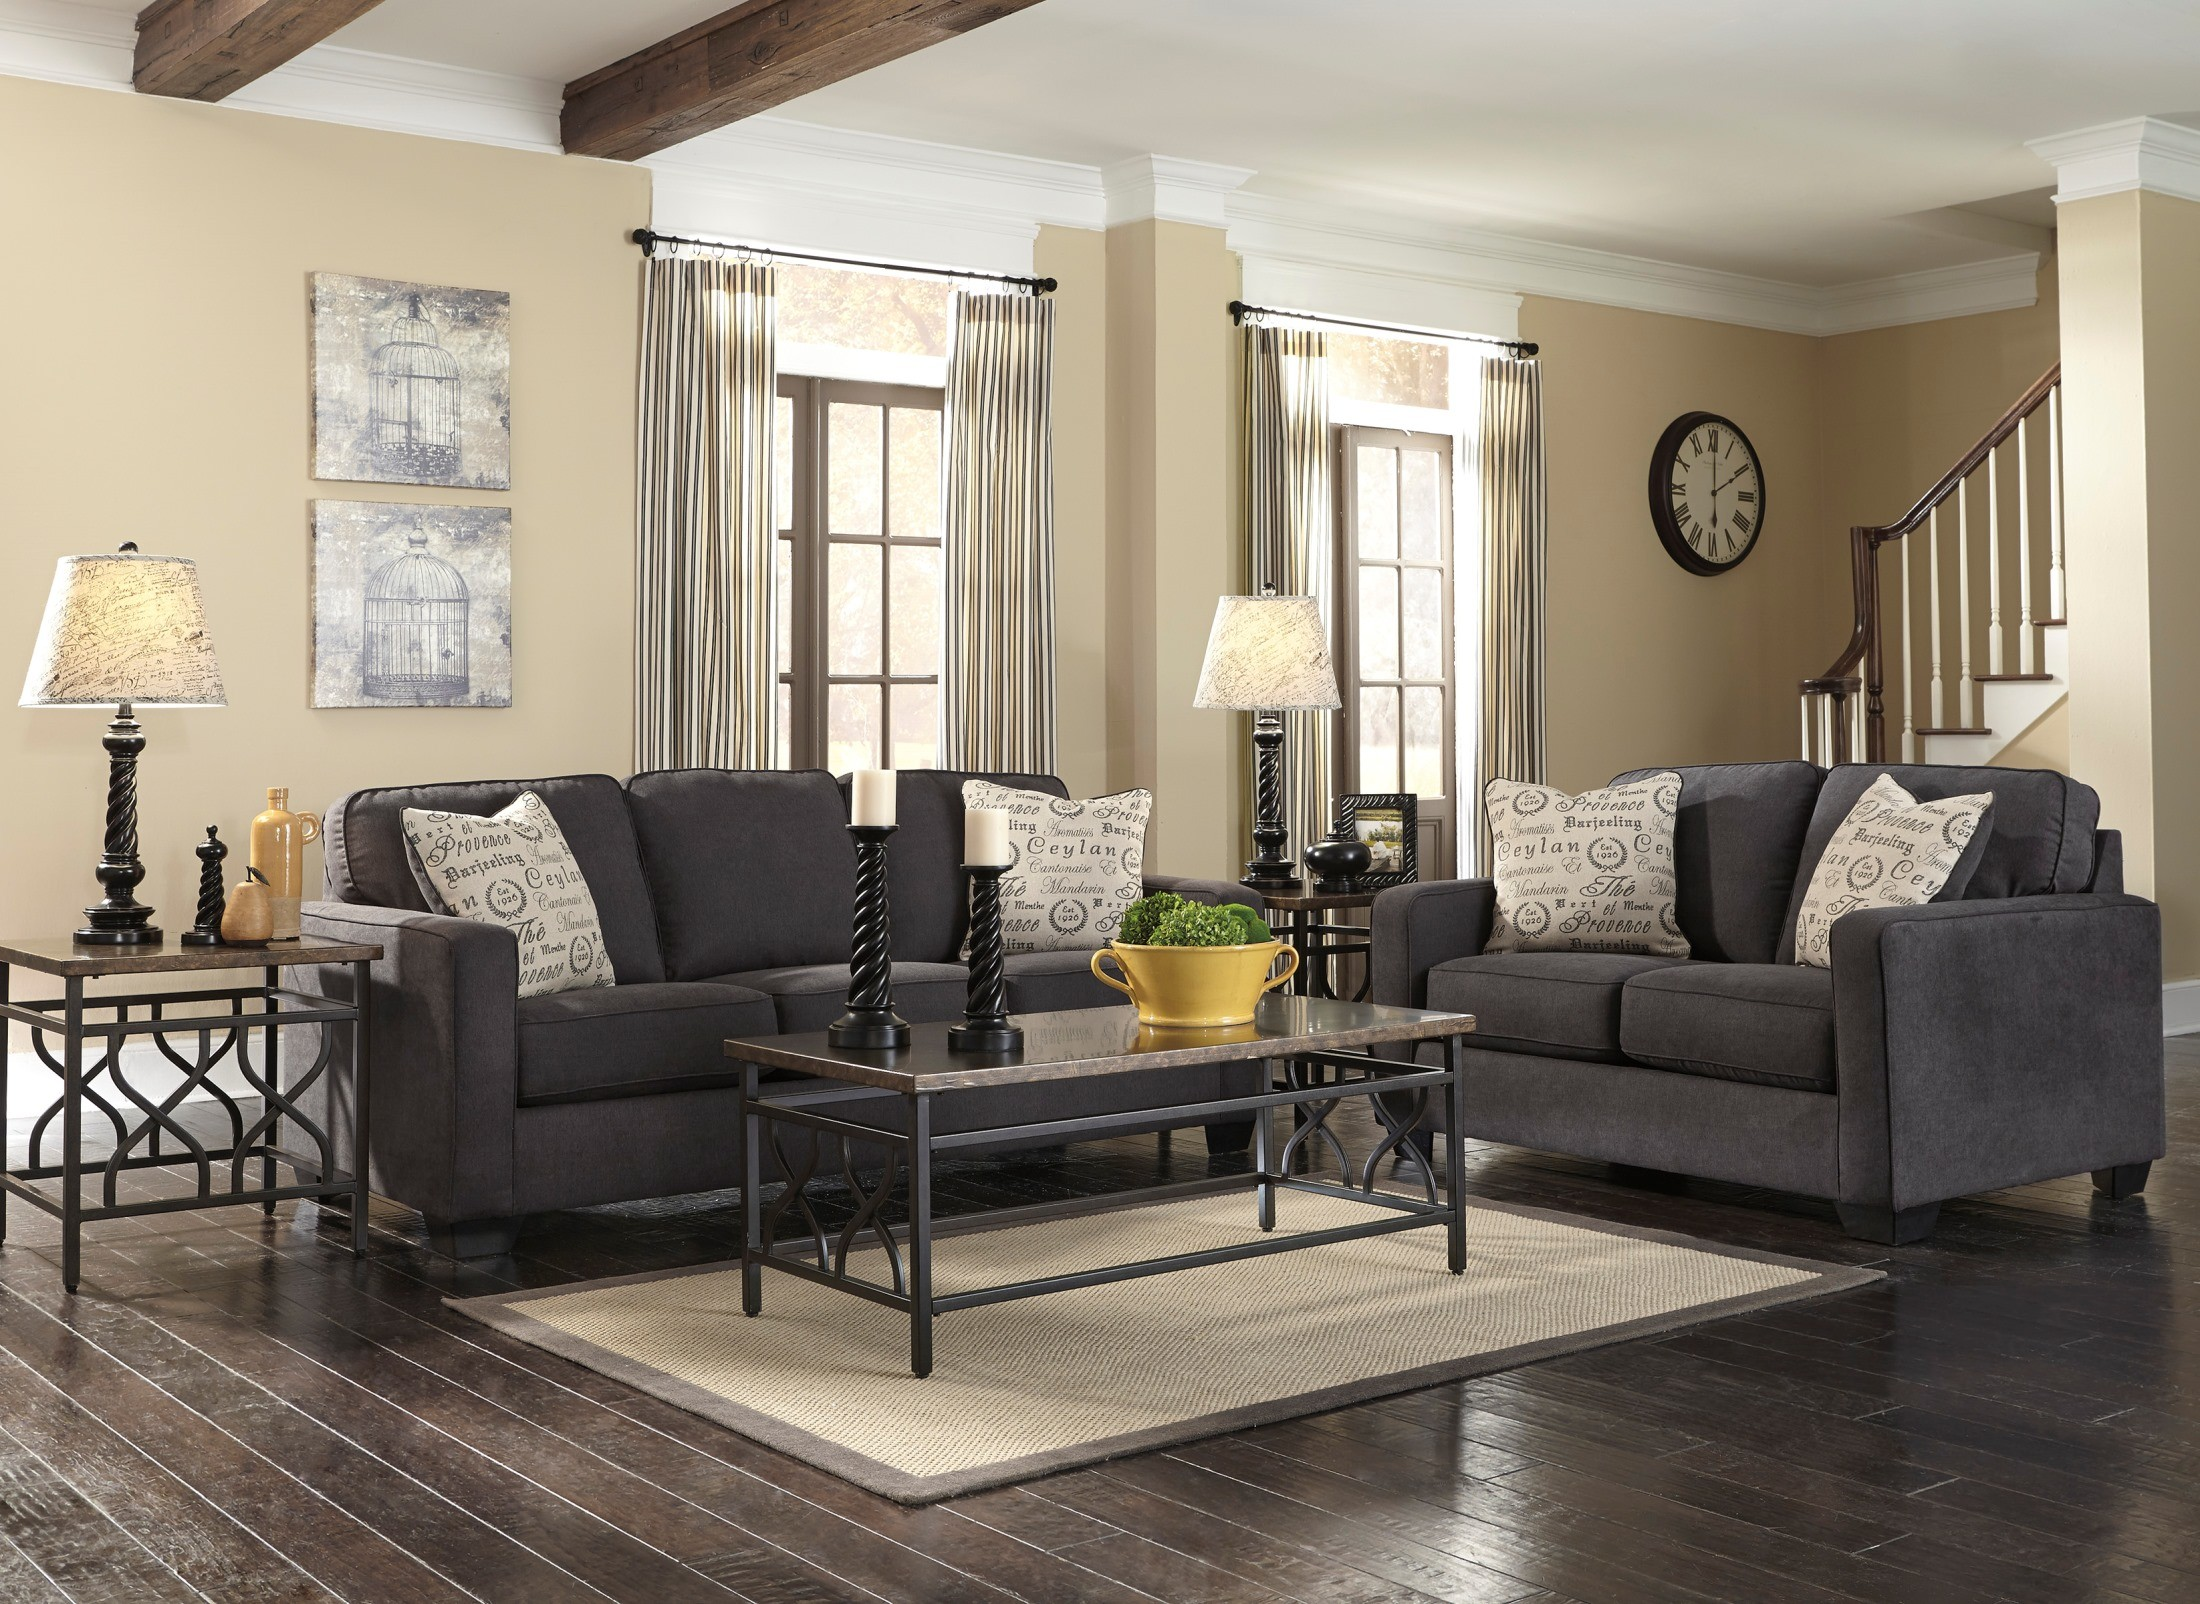 Pc Living Room Set Alenya Charcoal Living Room Set From Ashley 16601 38 35